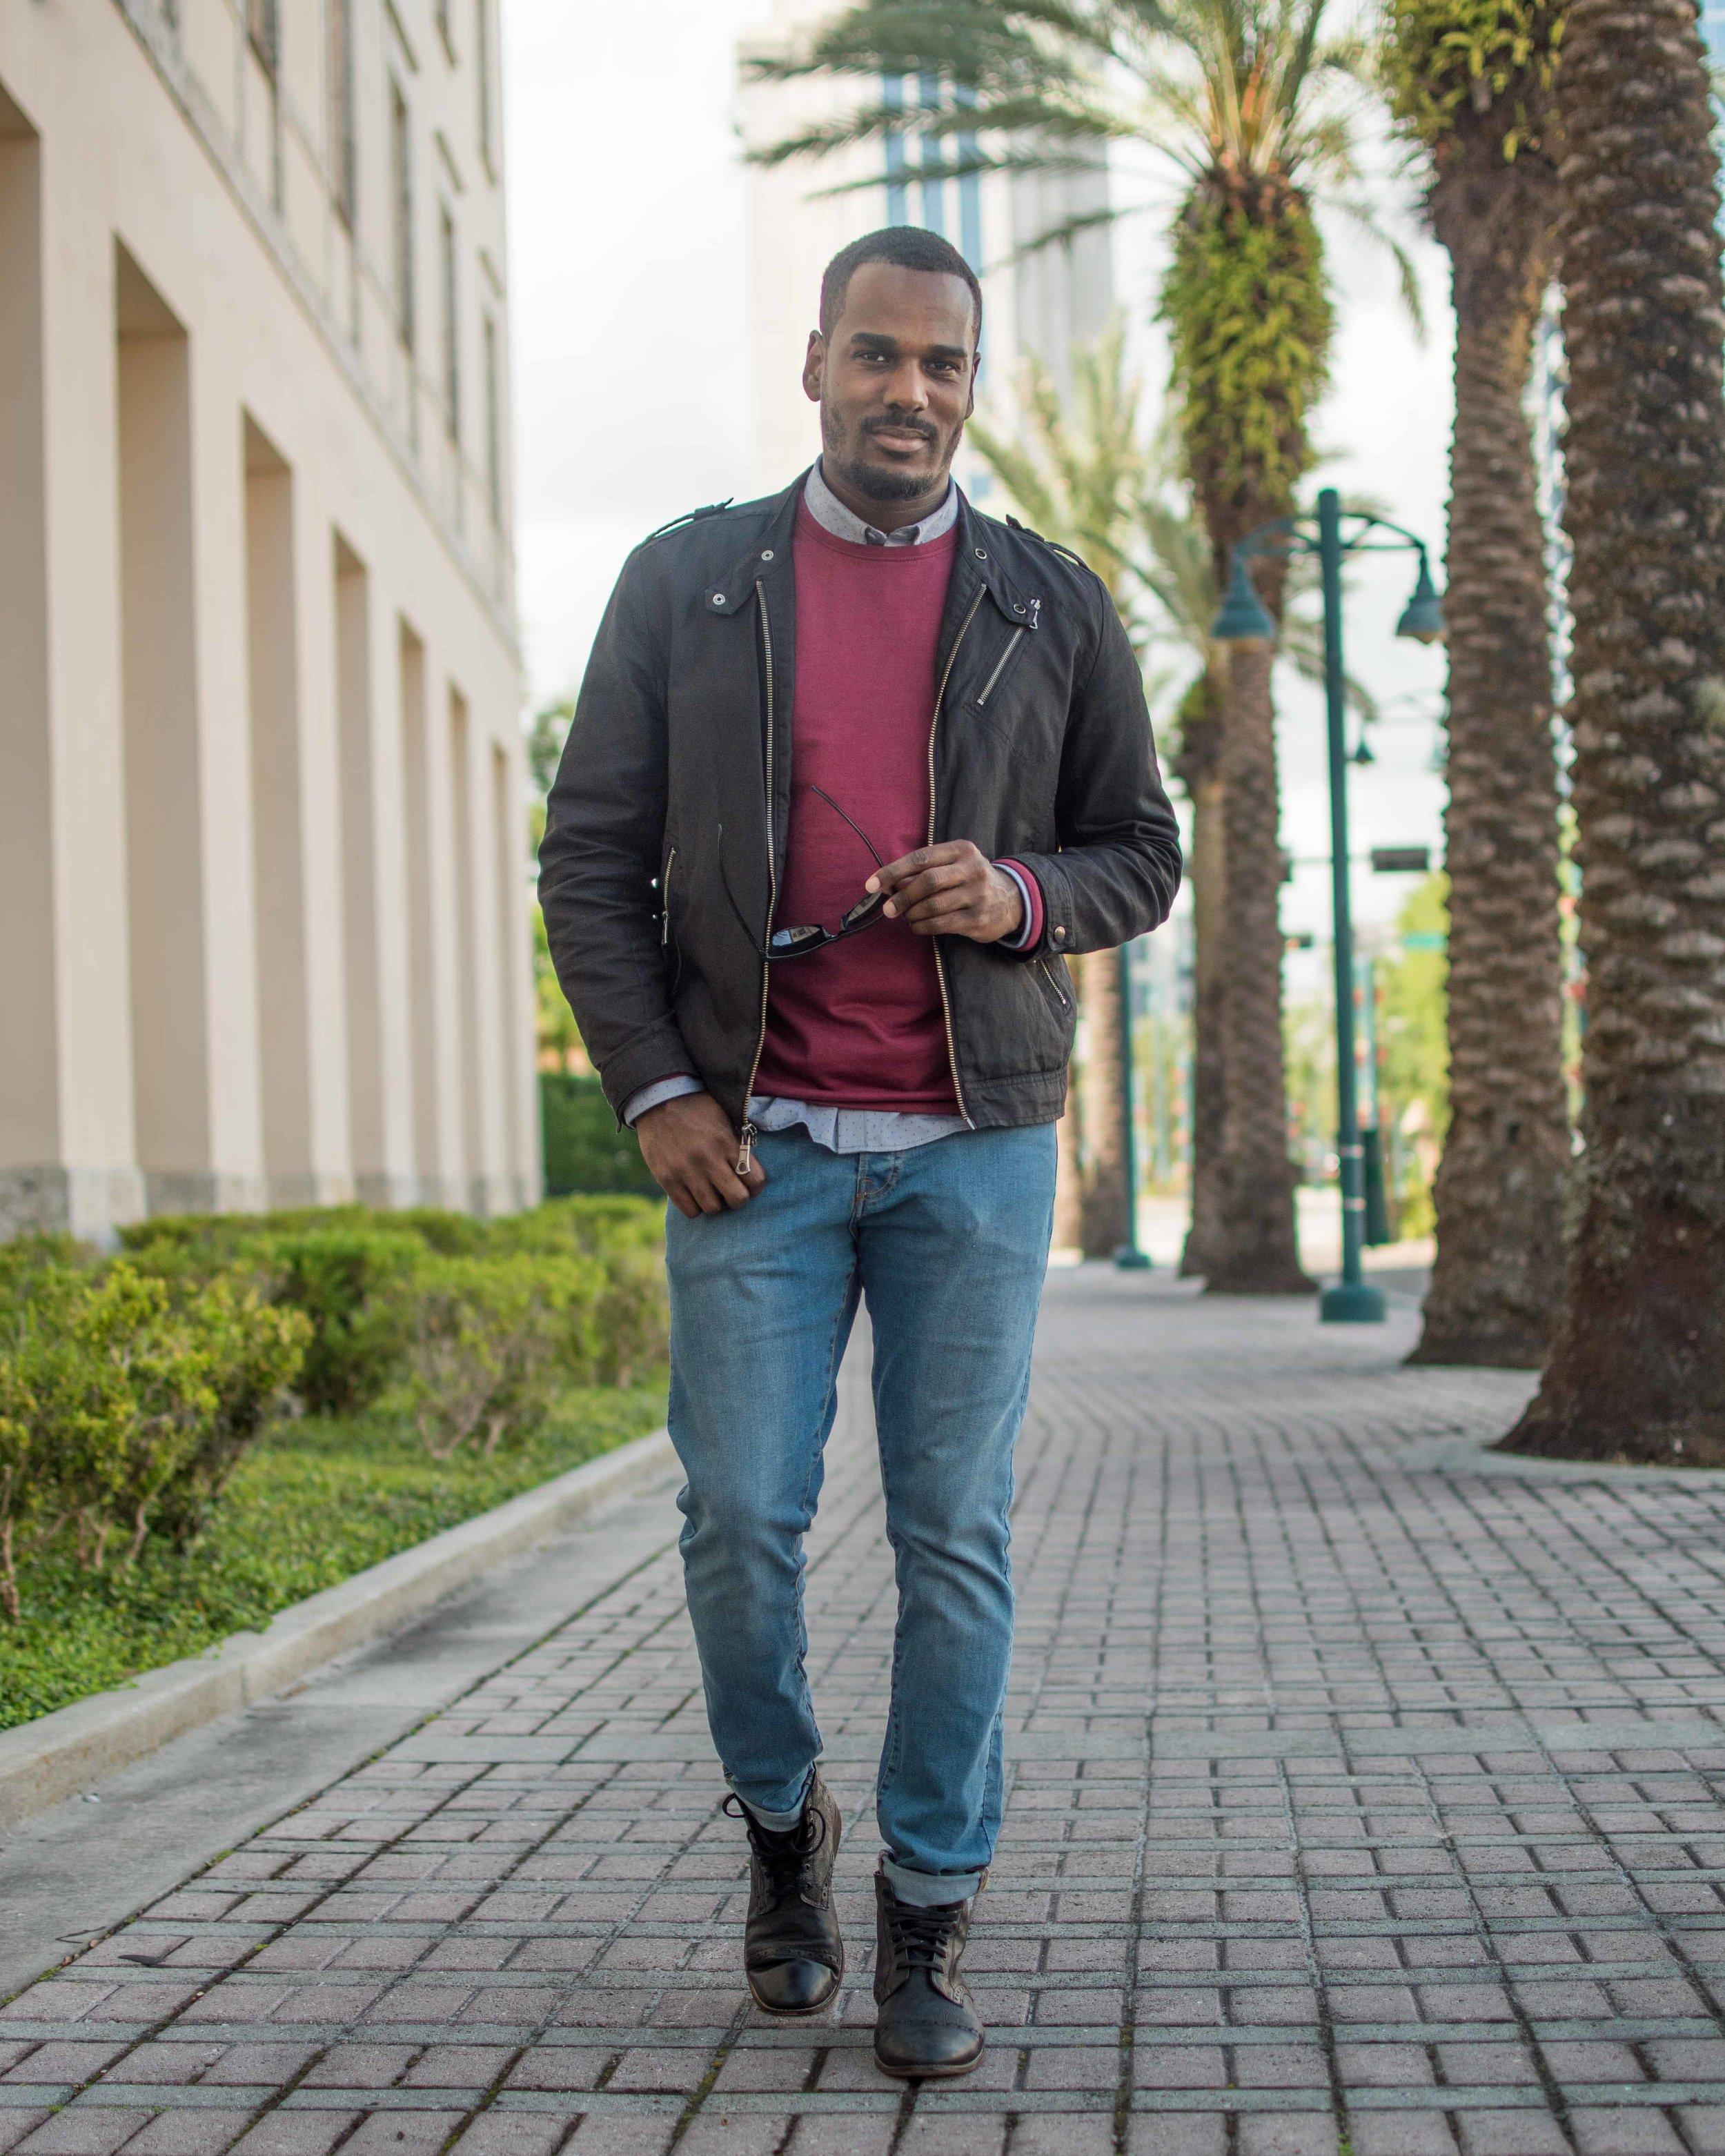 lindbergh sweater shirt jacket mens fashion spring 2018 gregsstyleguide